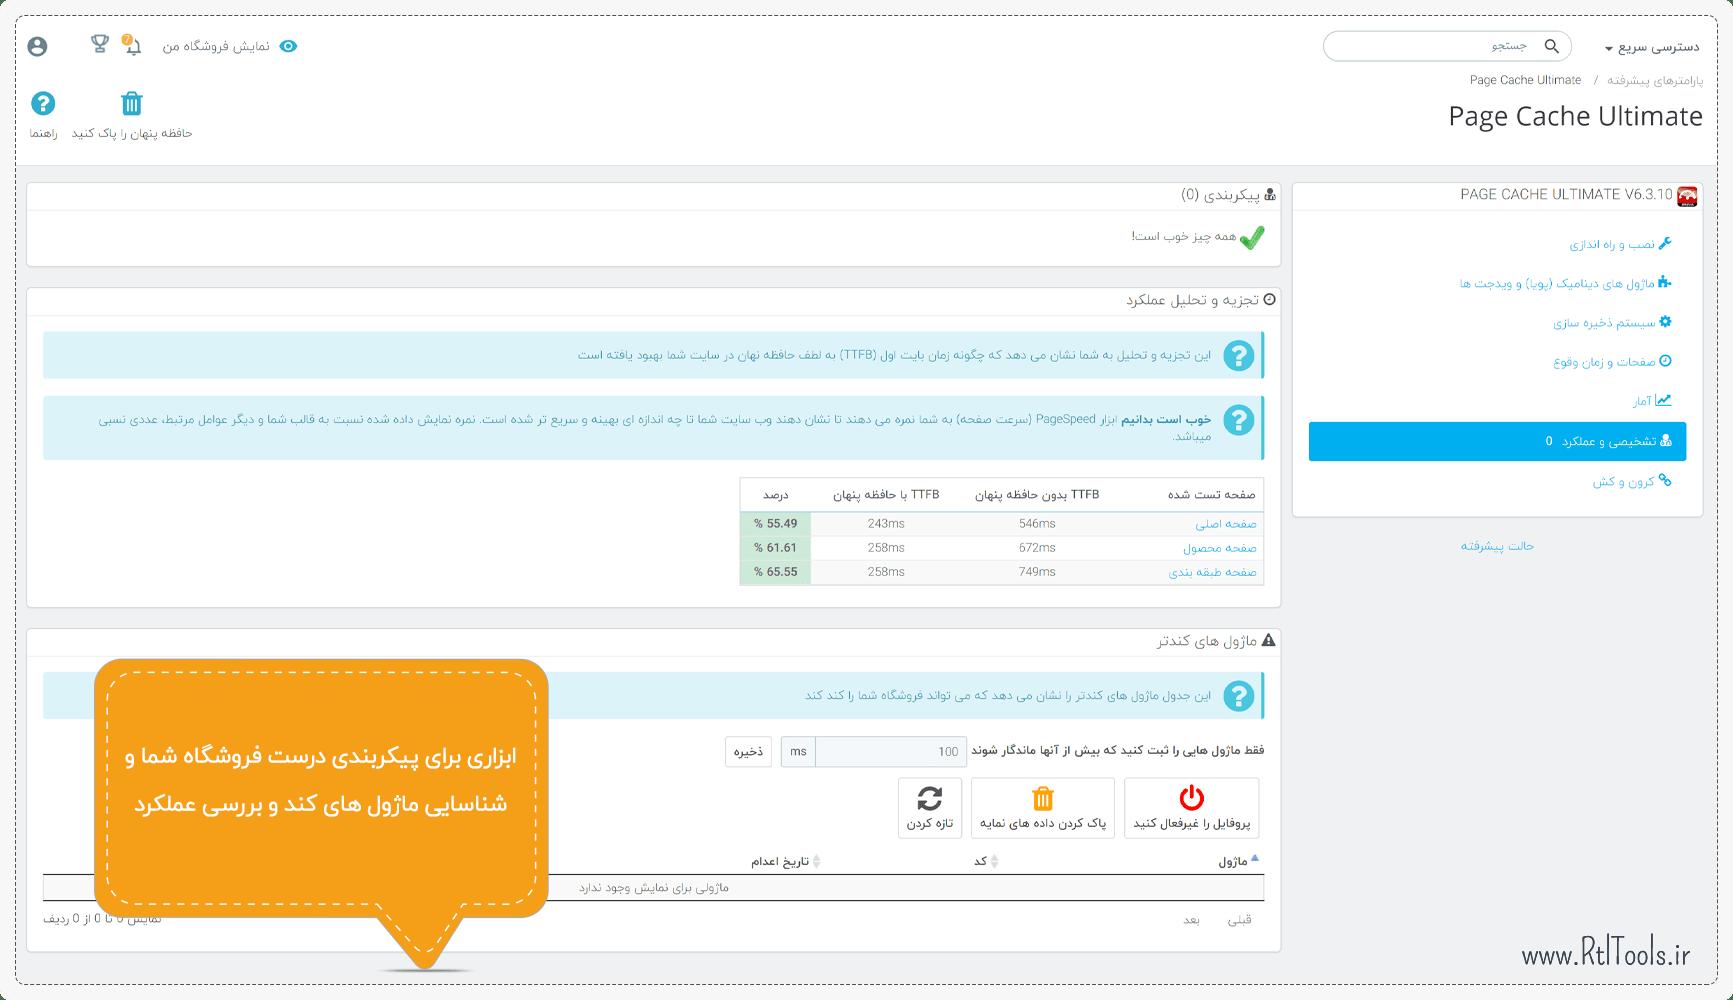 تجزیه و تحلیل عملکرد ماژول پرستاشاپ | Page Cache Ultimate Module